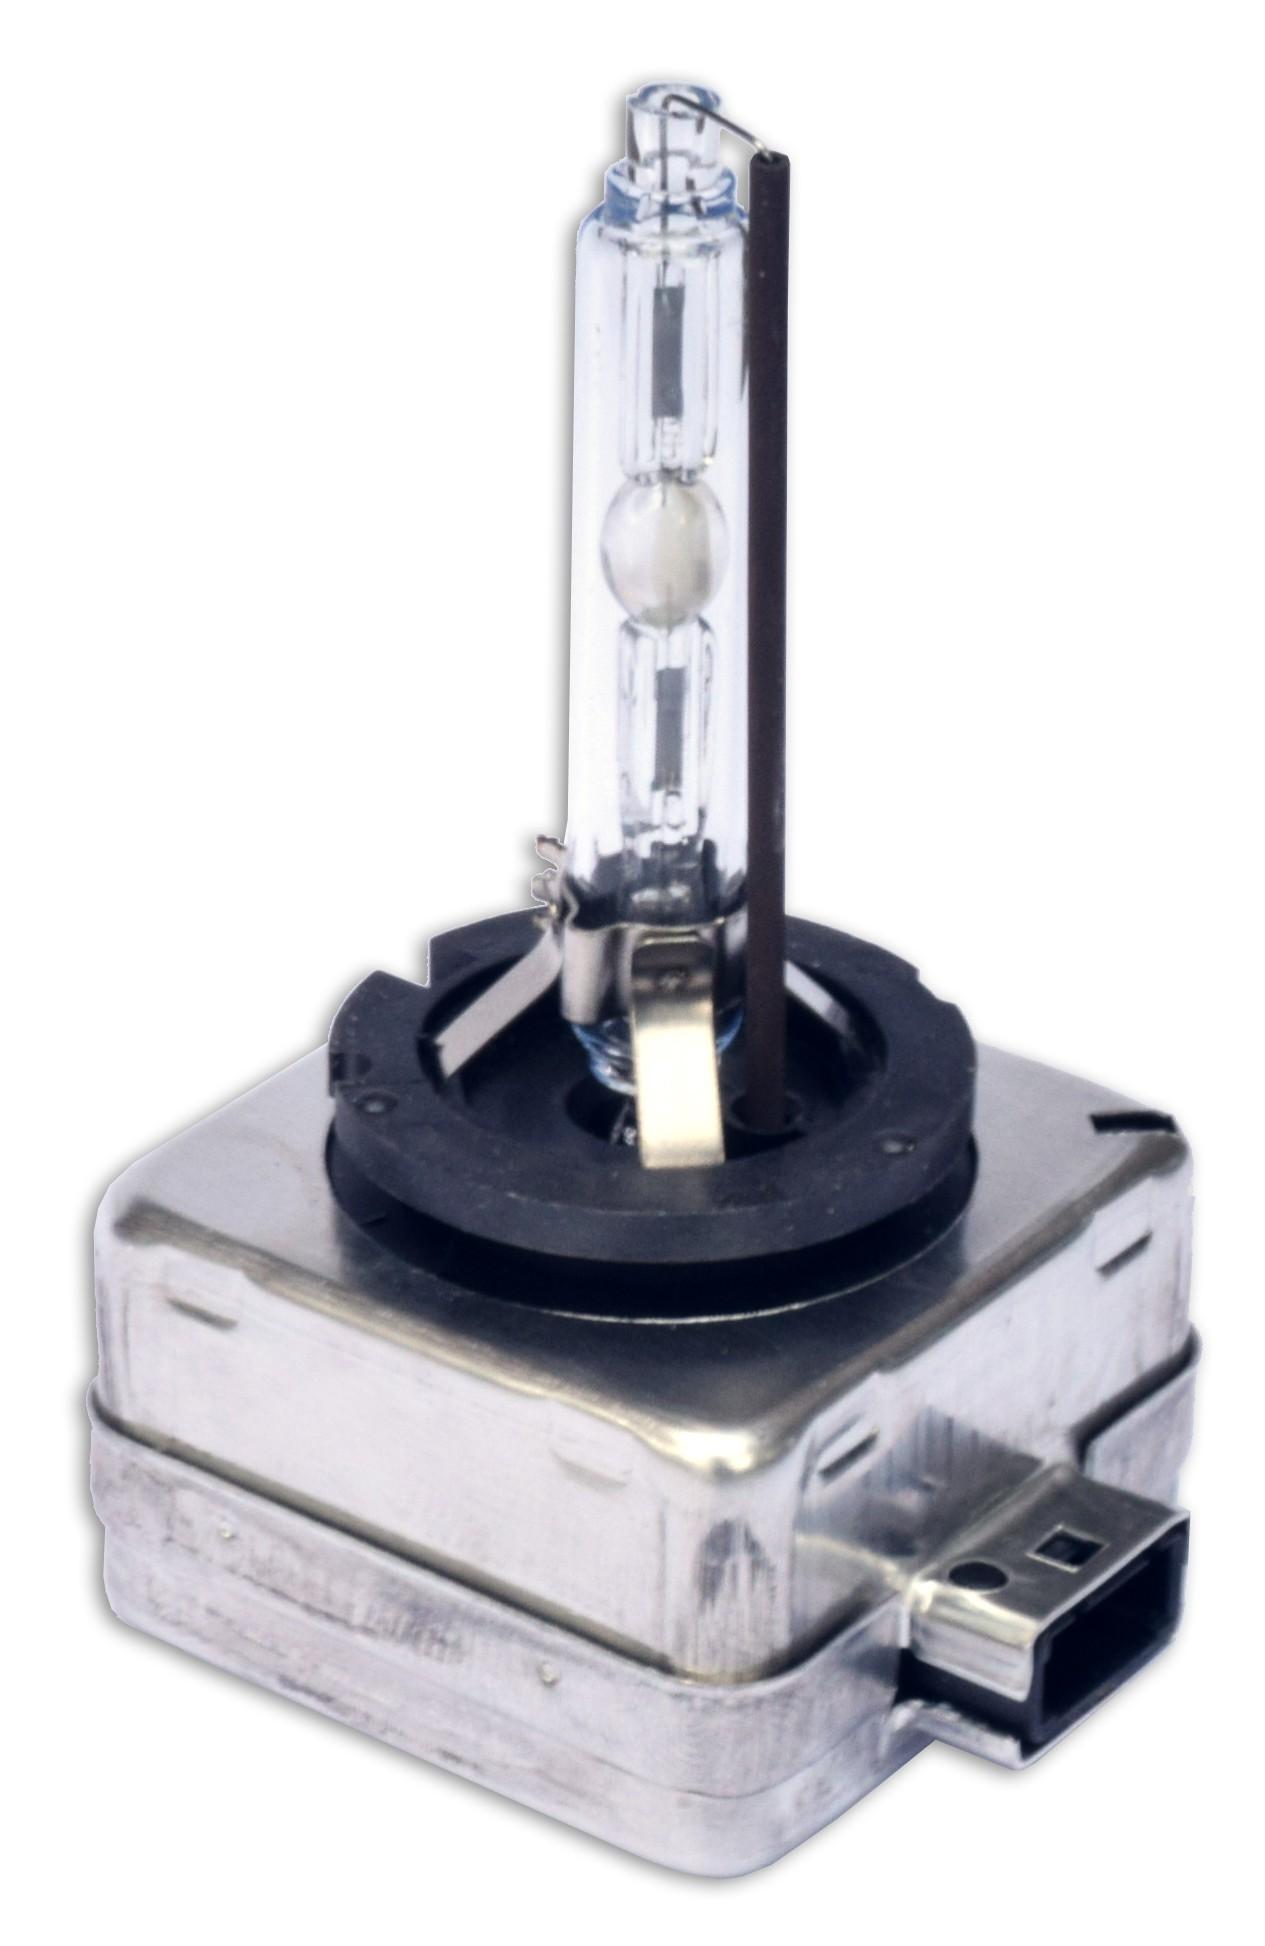 xenon lamp kopen hid xenon verlichting jpg 1265x1946 d1s xenon